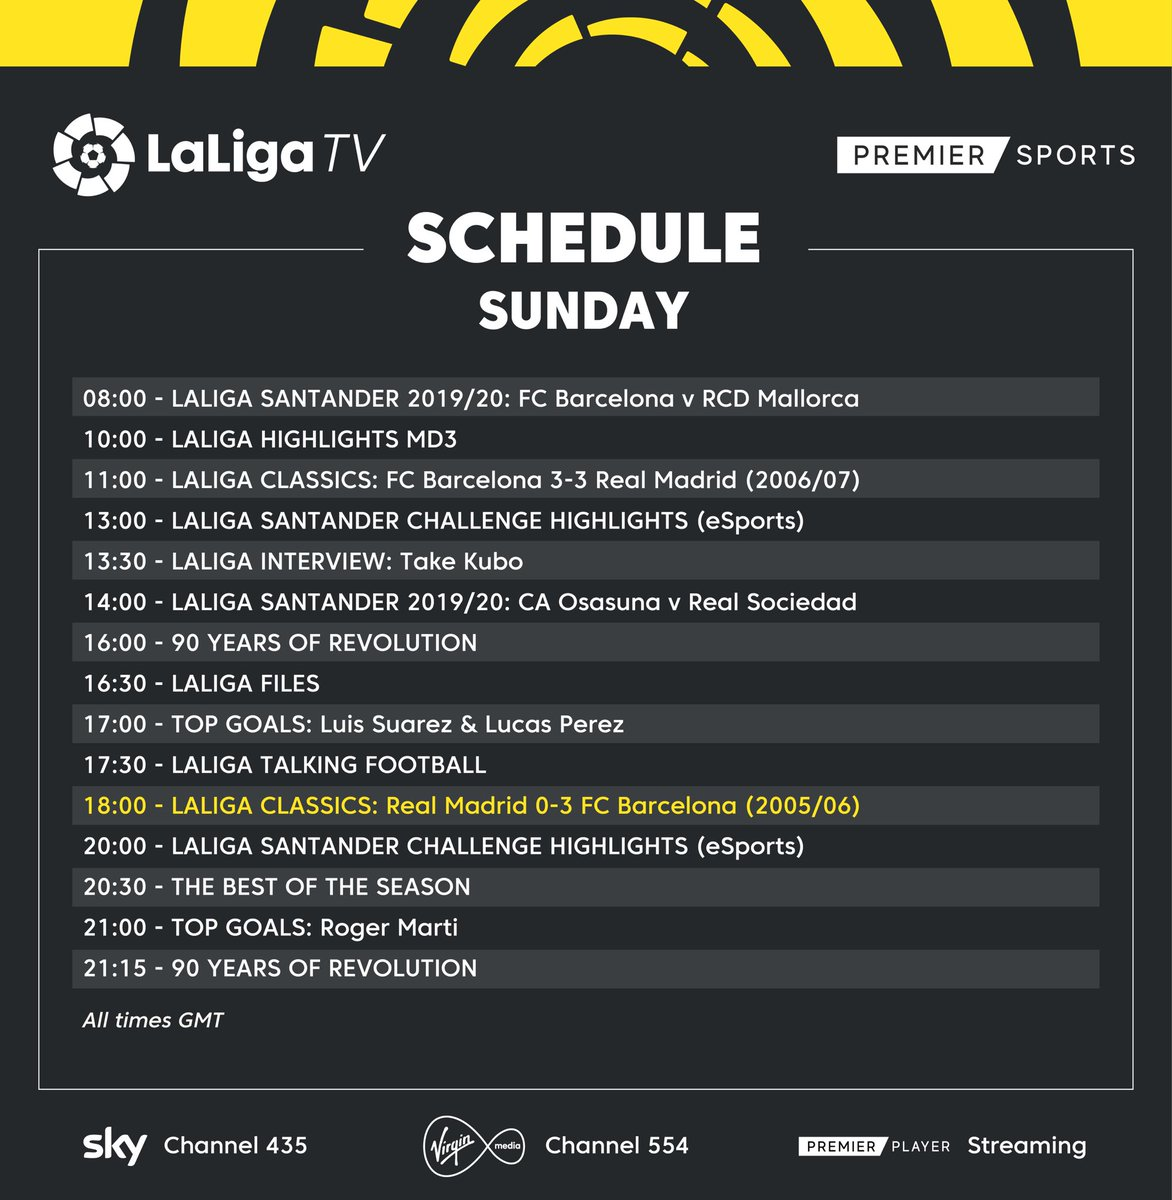 📅 𝗦𝗨𝗡𝗗𝗔𝗬 𝗦𝗖𝗛𝗘𝗗𝗨𝗟𝗘 📺 Two #LaLigaClassics for you to enjoy today on #LaLigaTV! #StayAtHome